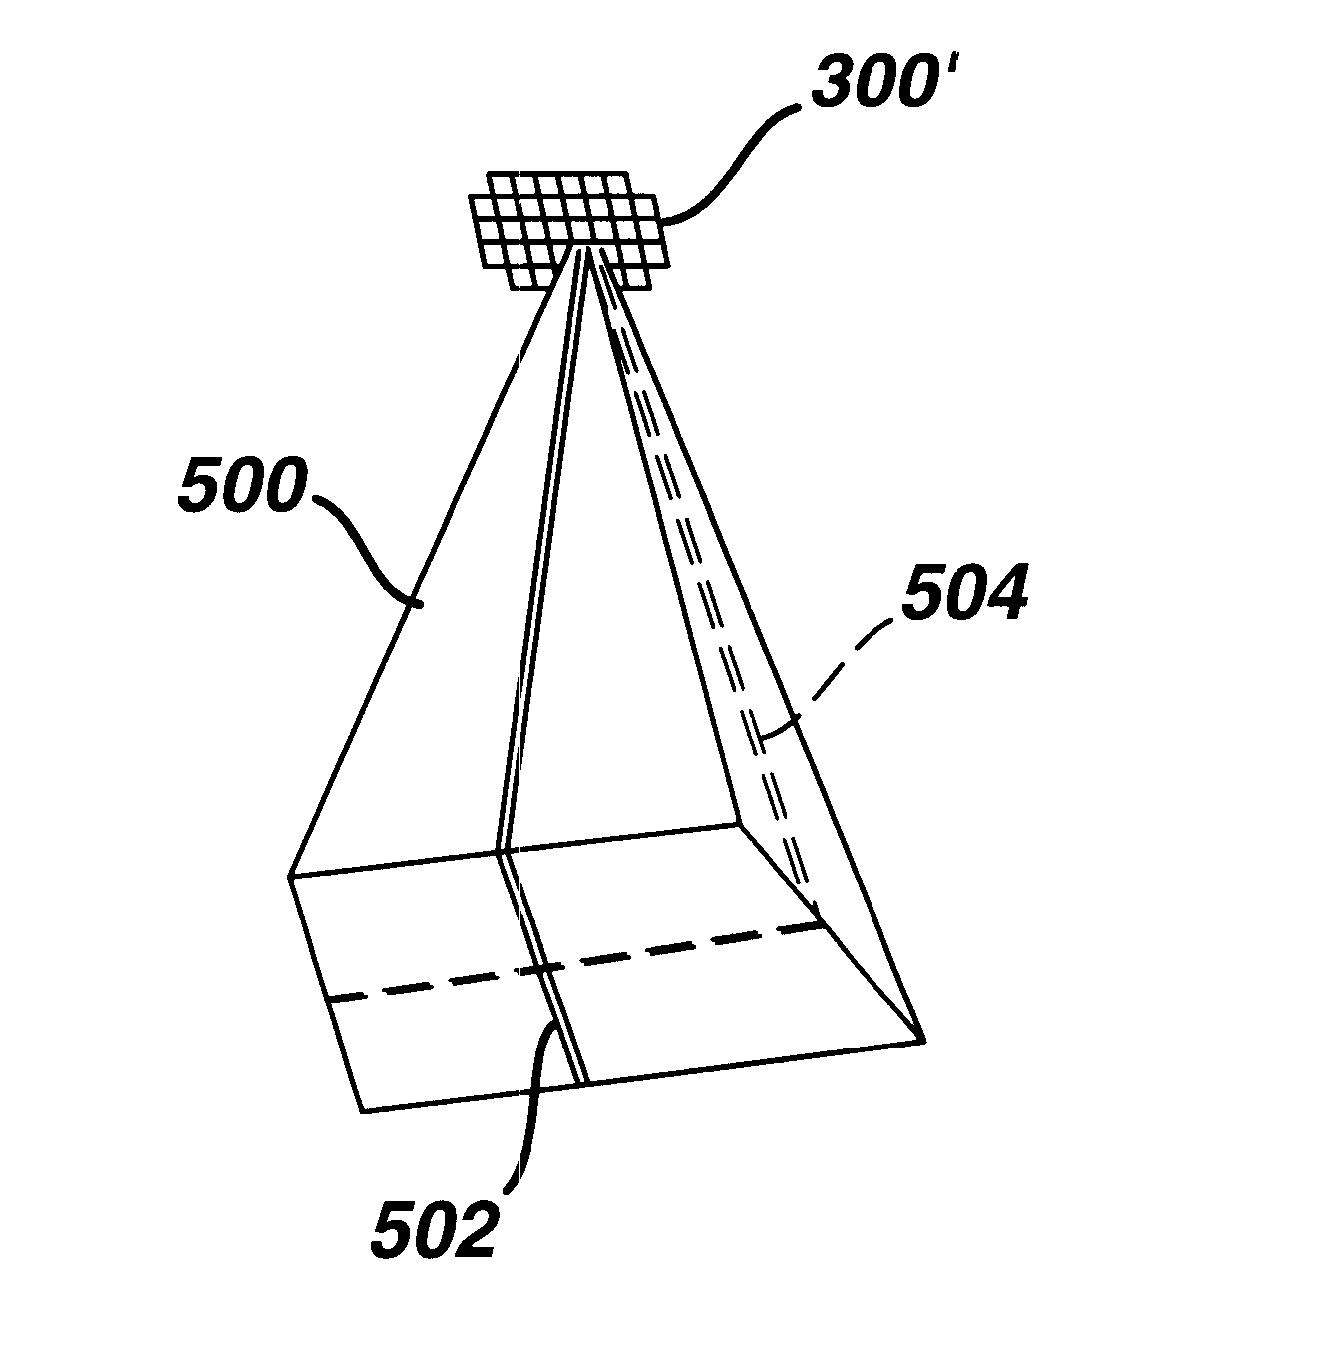 4 Pole Single Throw Switch Diagram - All Diagram Schematics